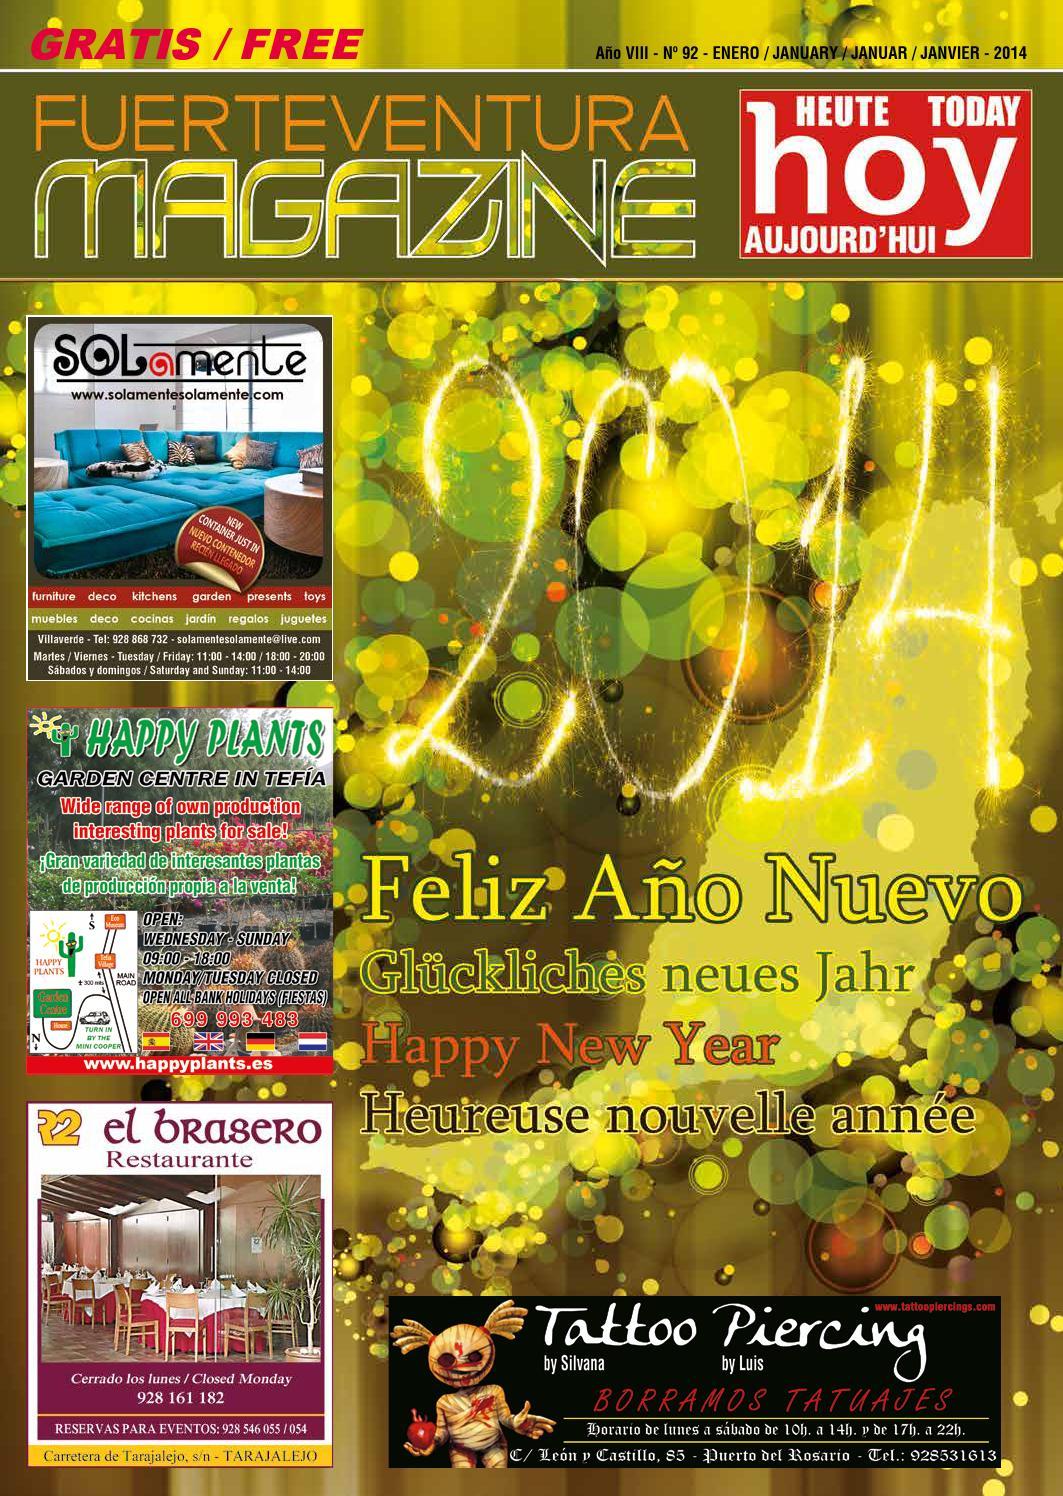 Fuerteventura Magazine Hoy Nº 92 Enero 2014 By Fuerteventura